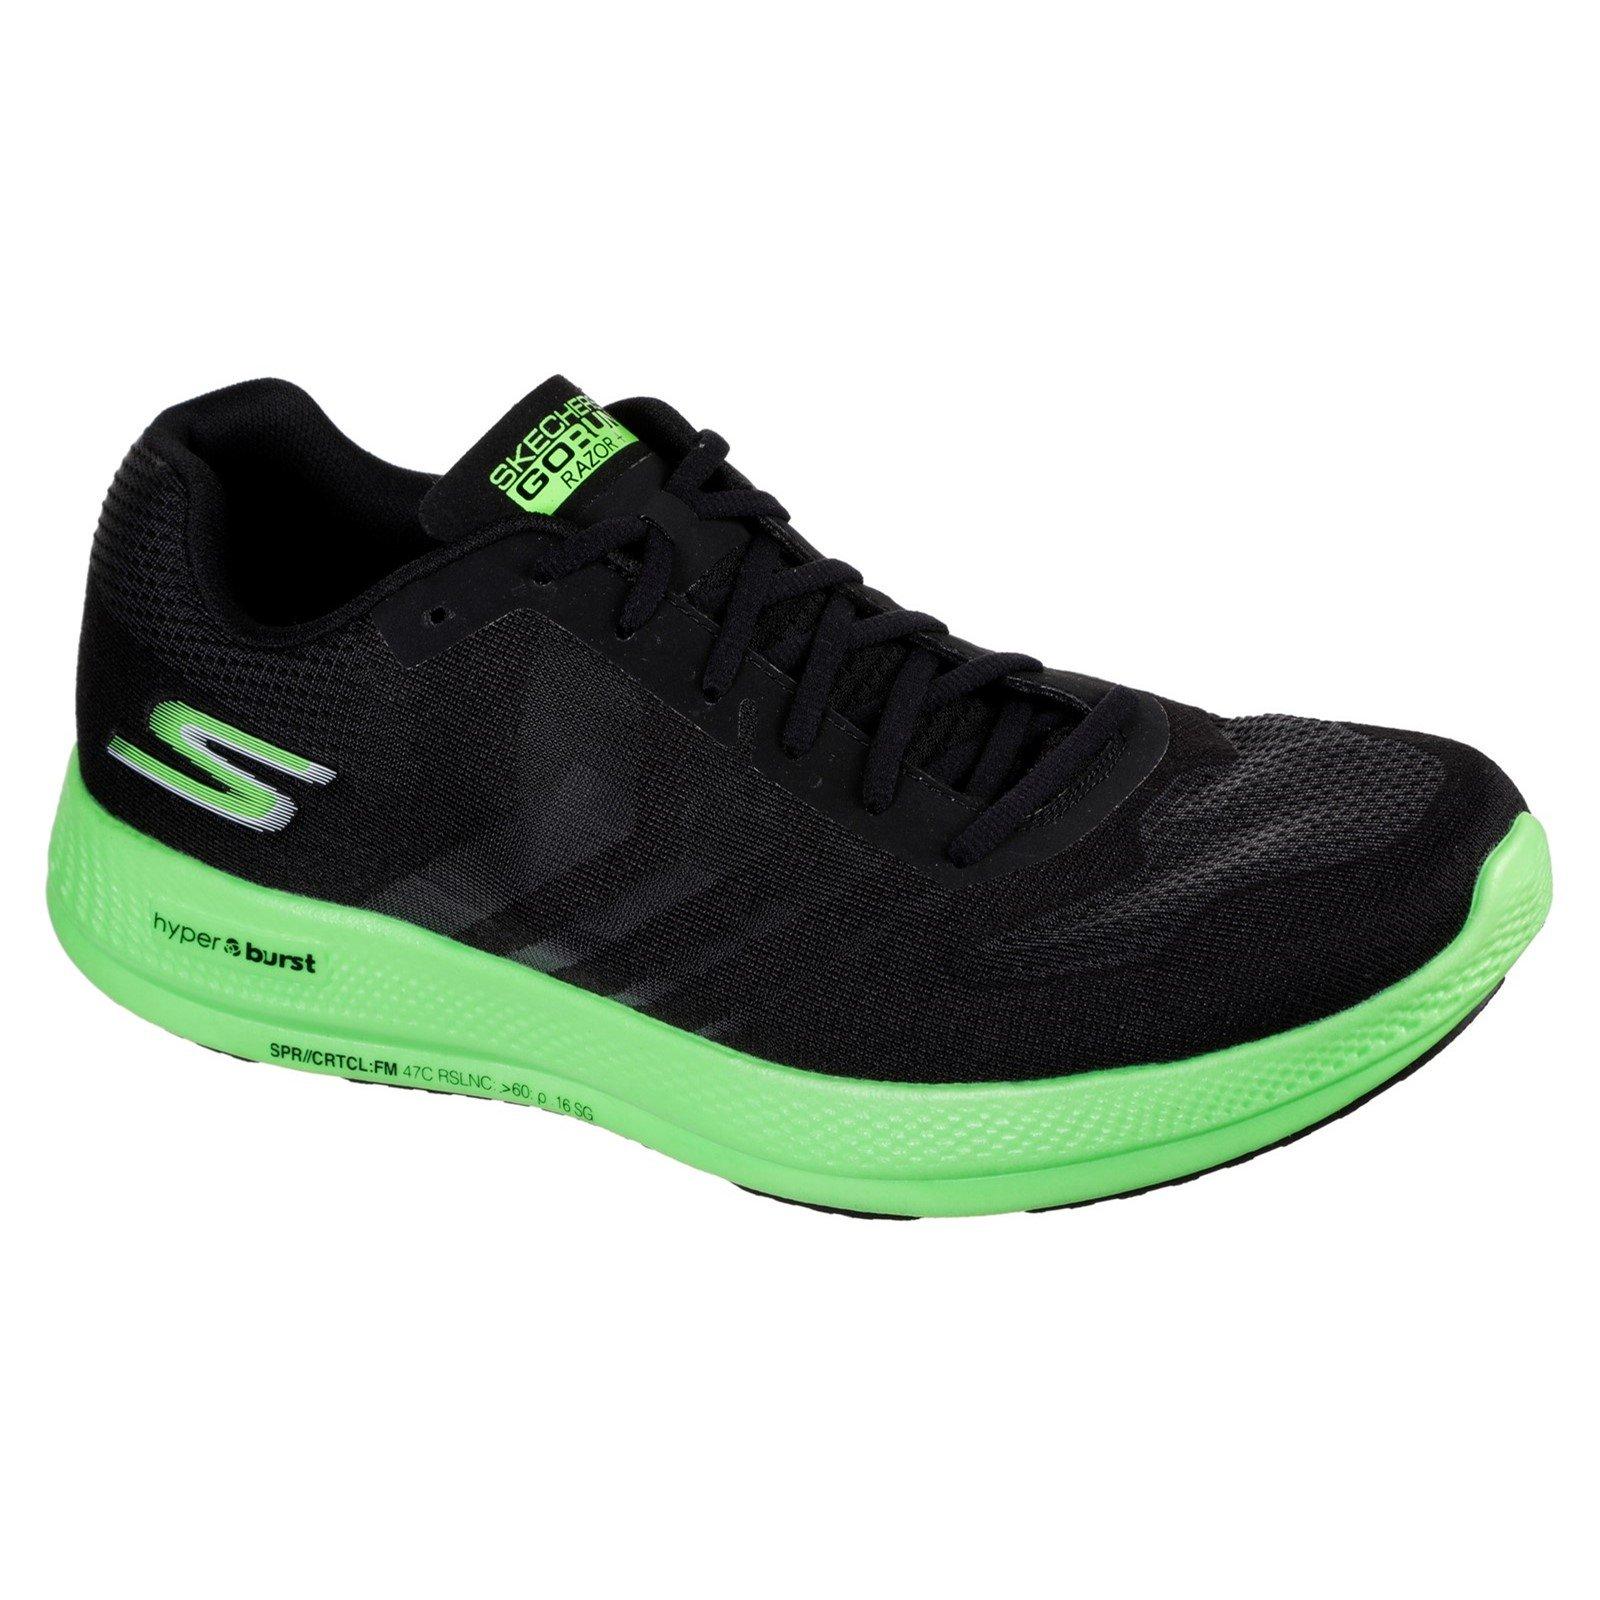 Skechers Men's Go Run Razor Trainer Multicolor 32699 - Black/Green 12